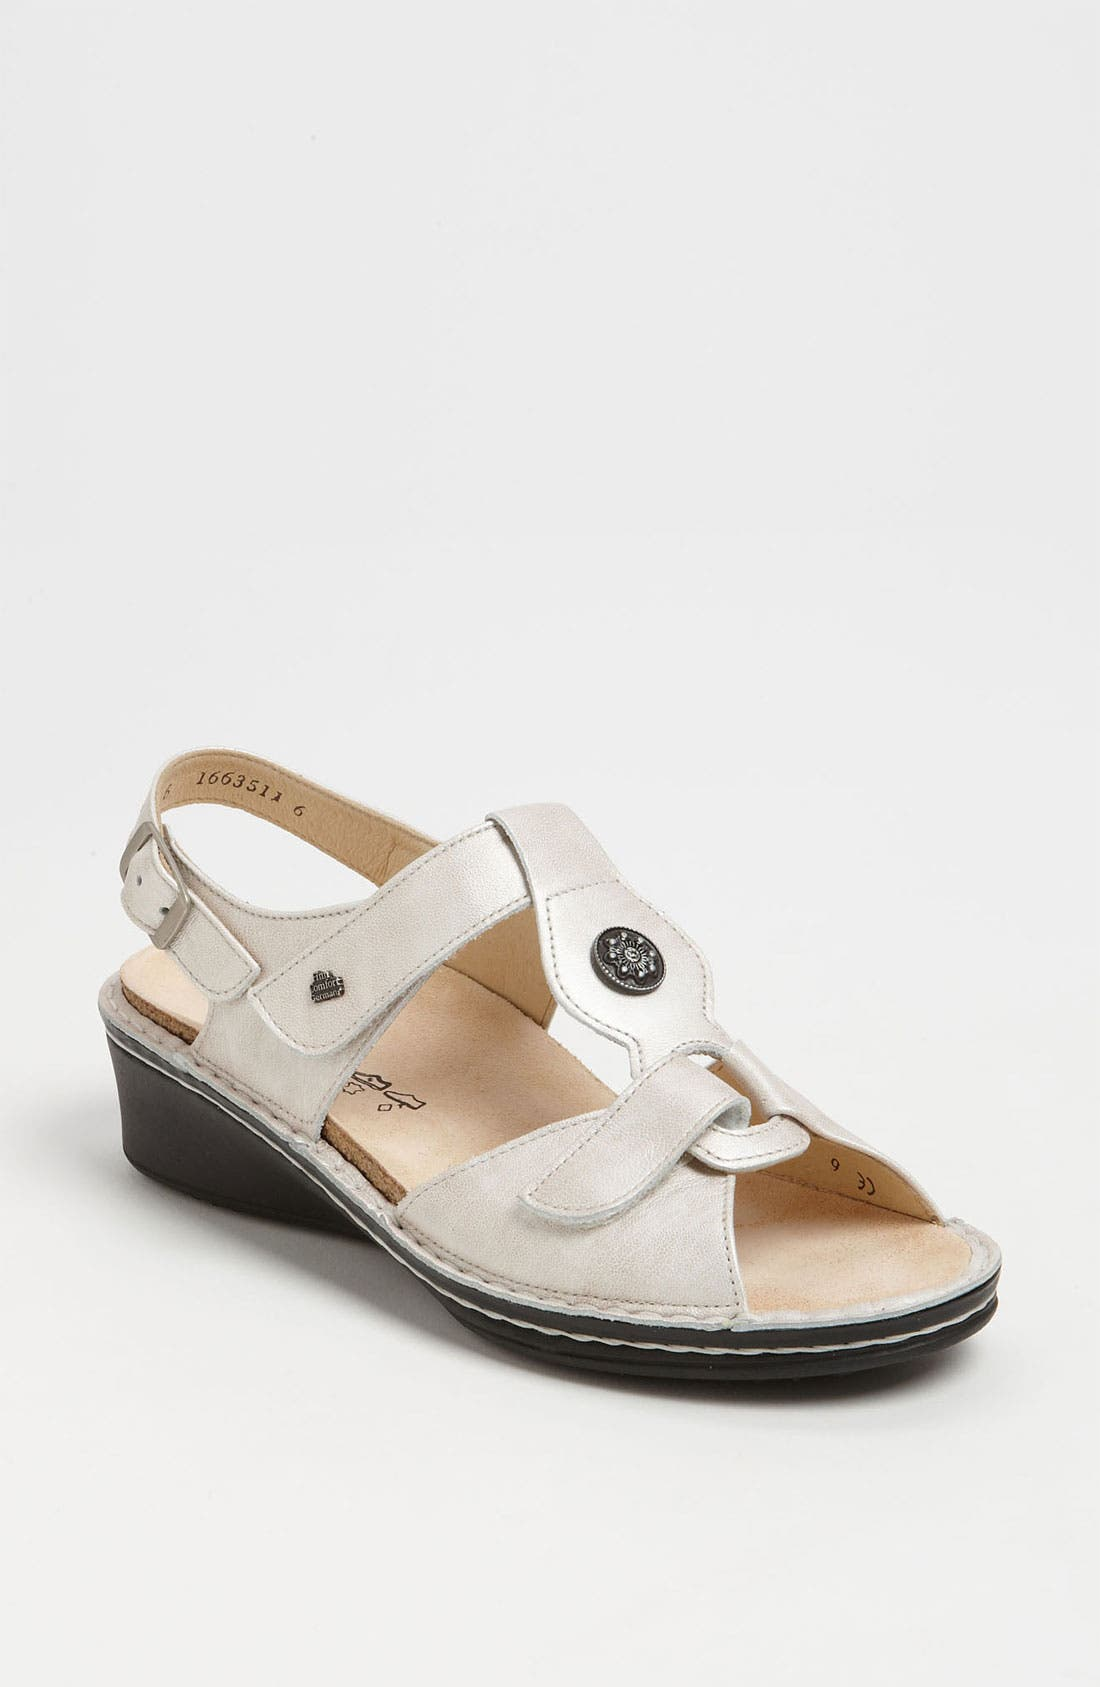 Main Image - Finn Comfort 'Adana' Sandal